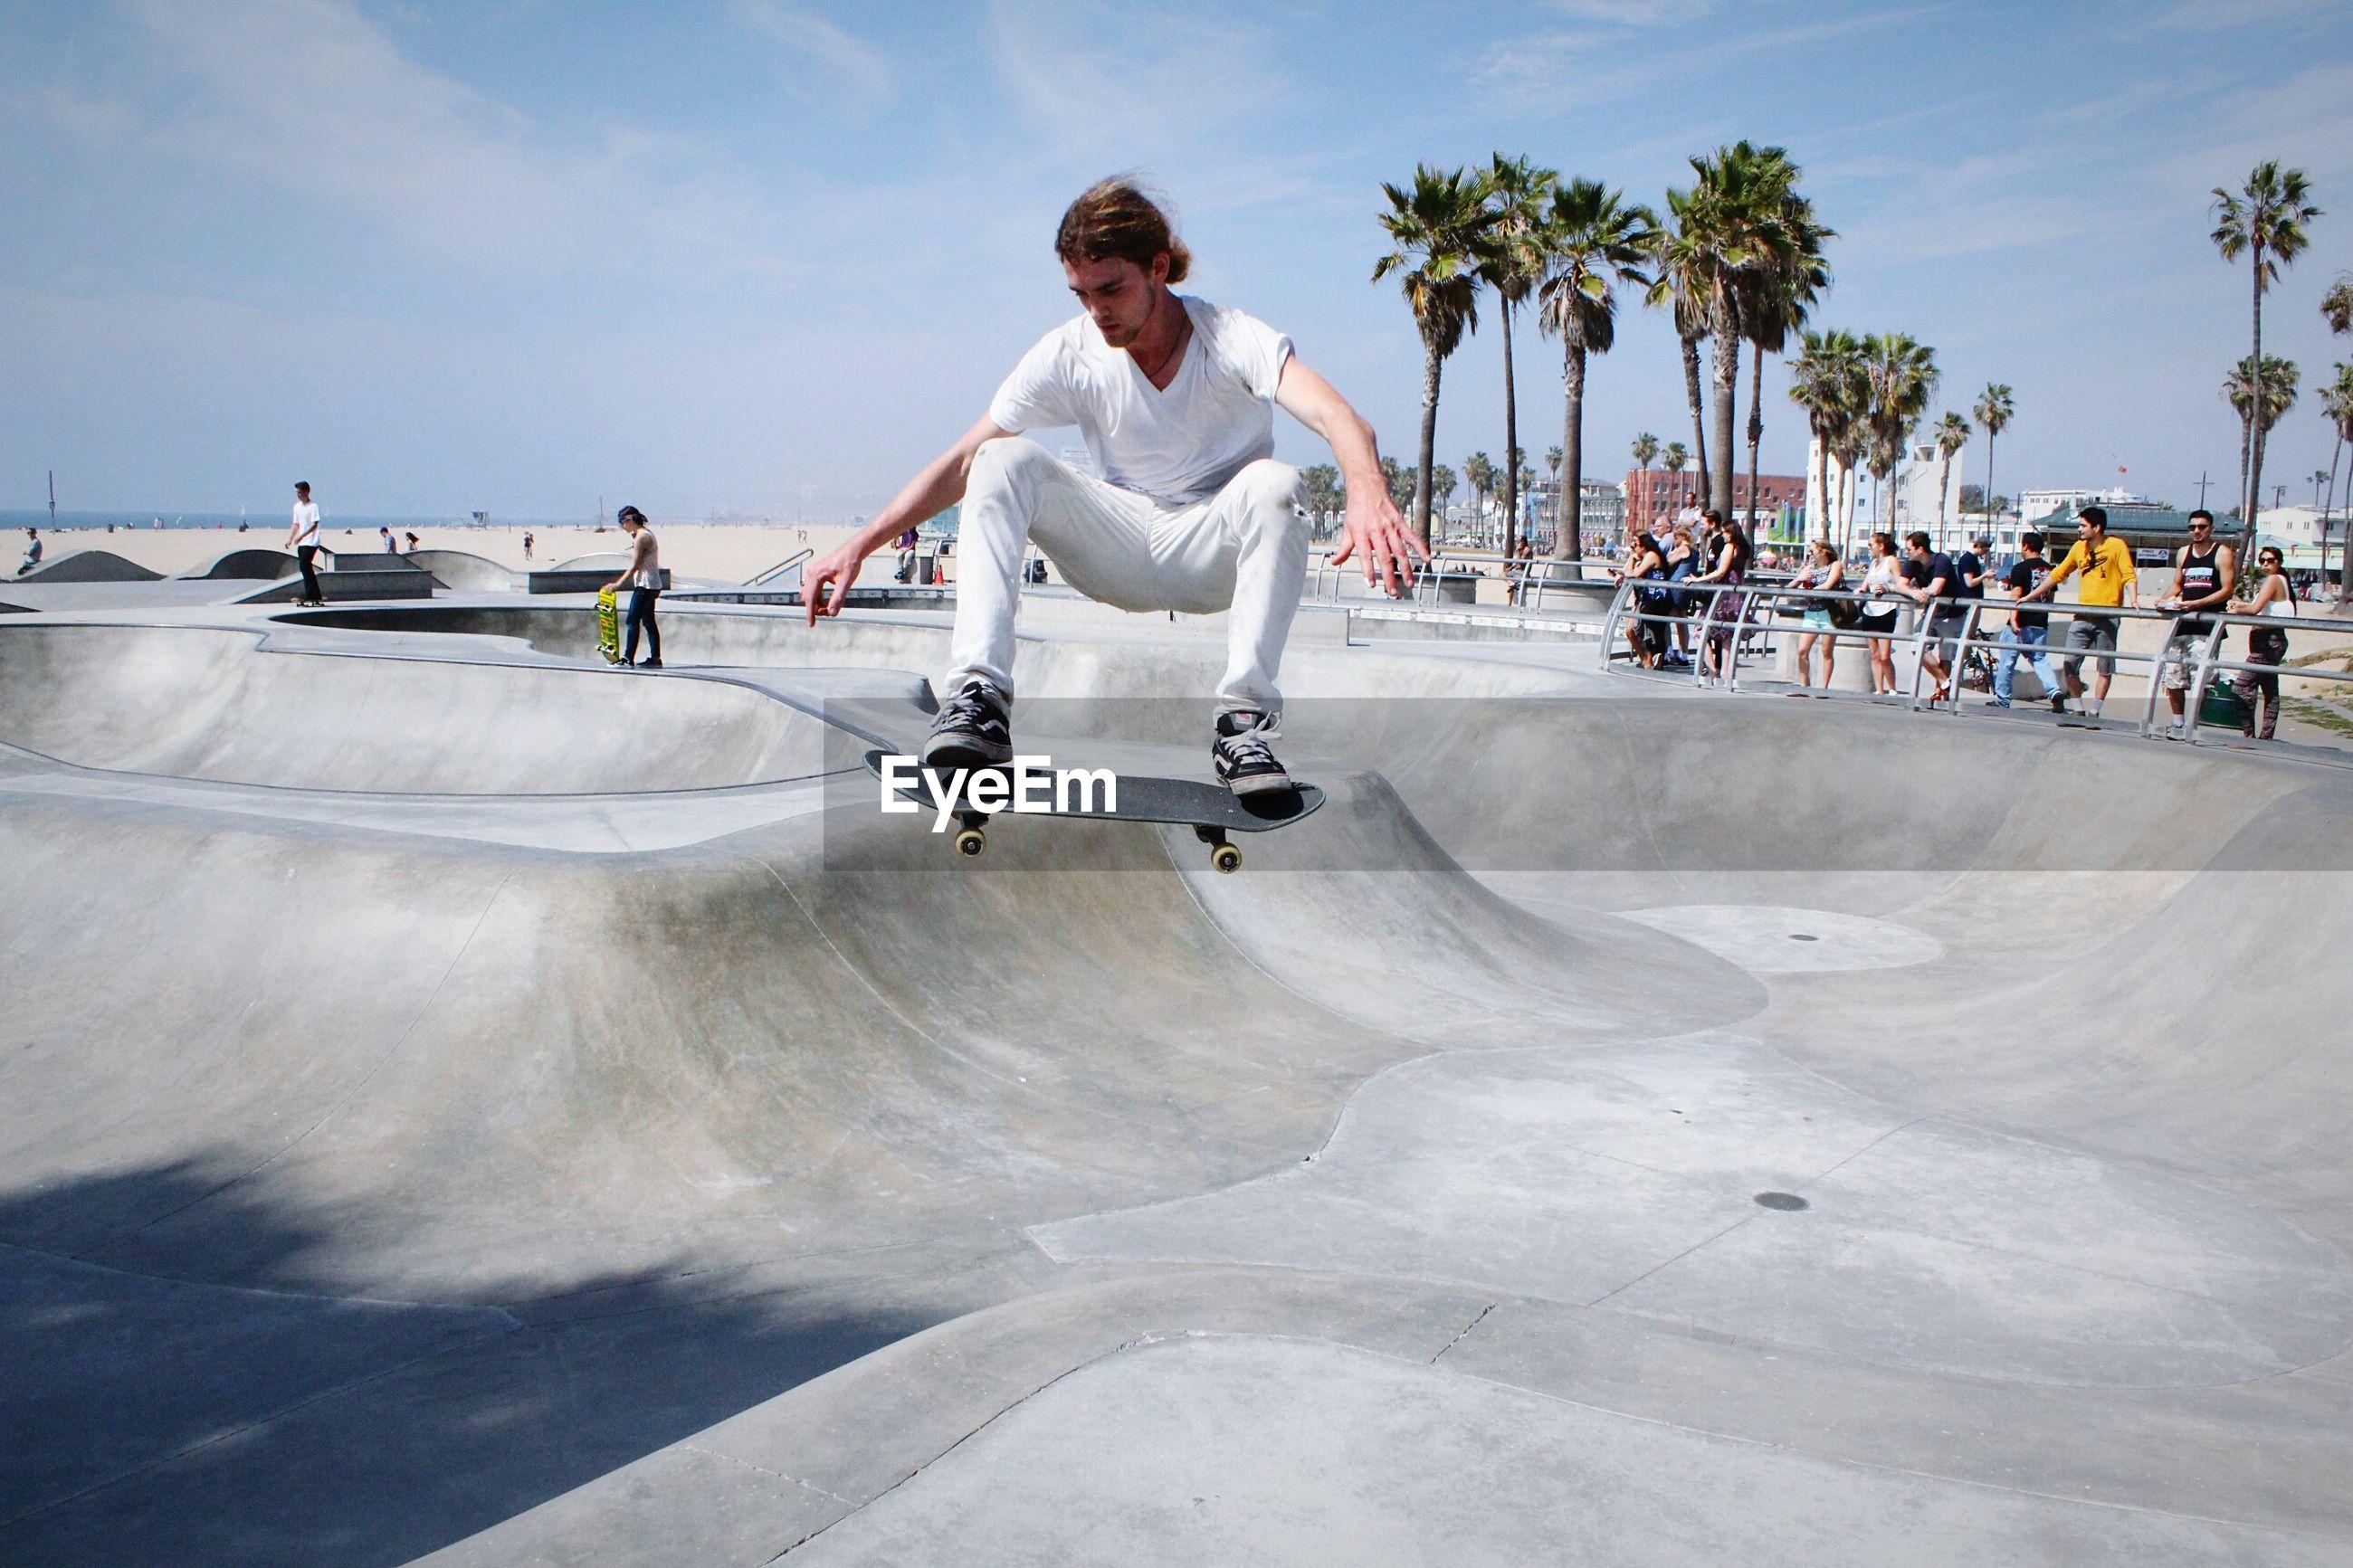 WOMAN JUMPING ON SKATEBOARD